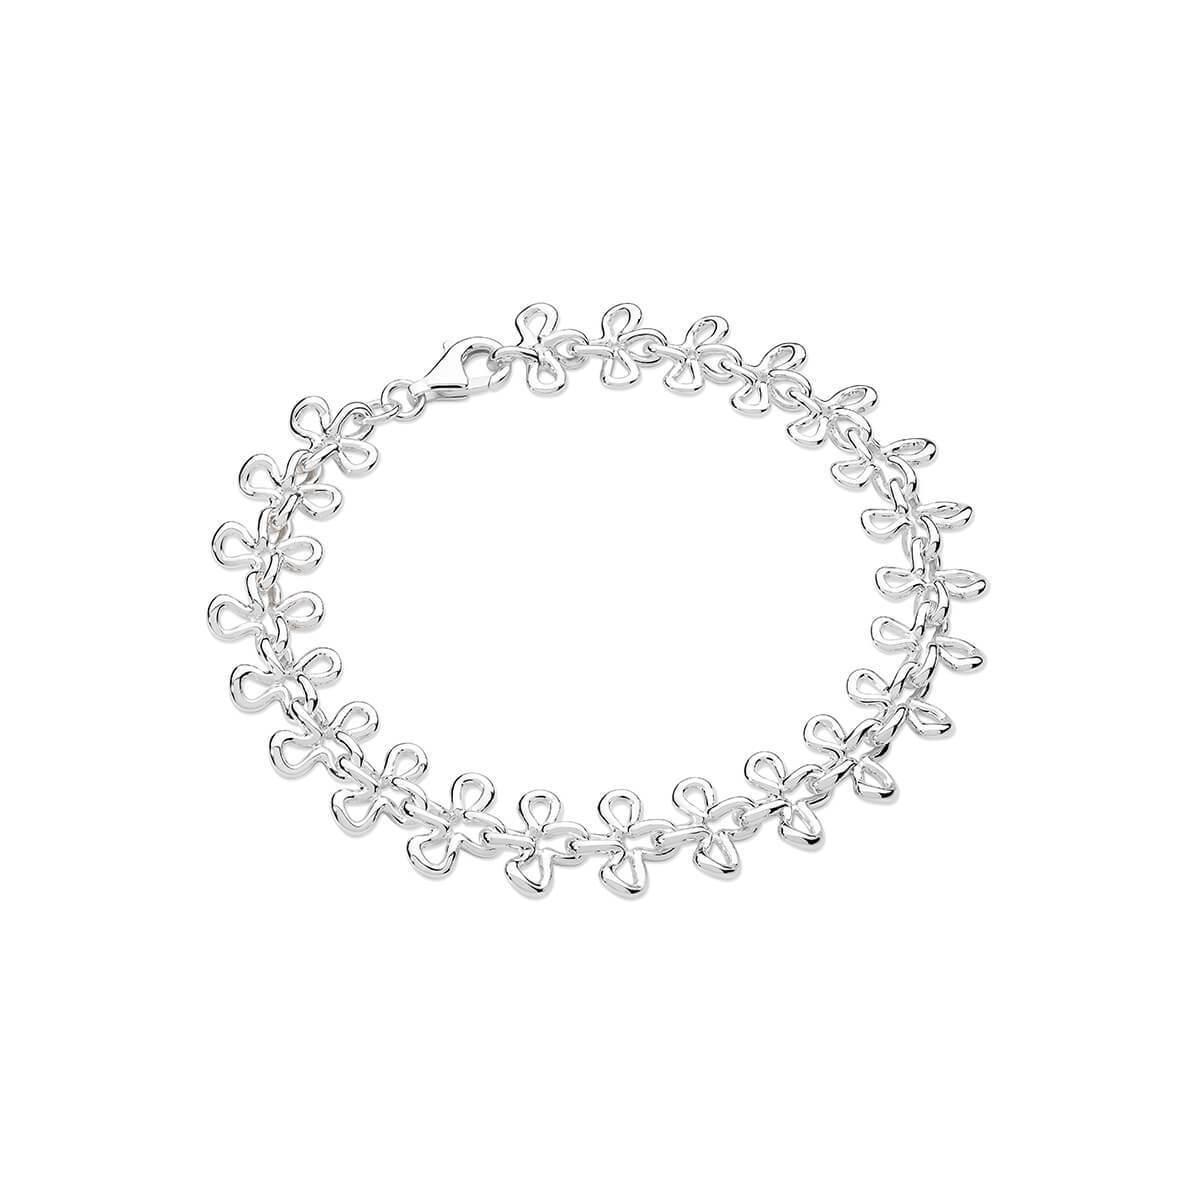 Lucy Quartermaine Splash Bracelet 2 m1pZNm7CX